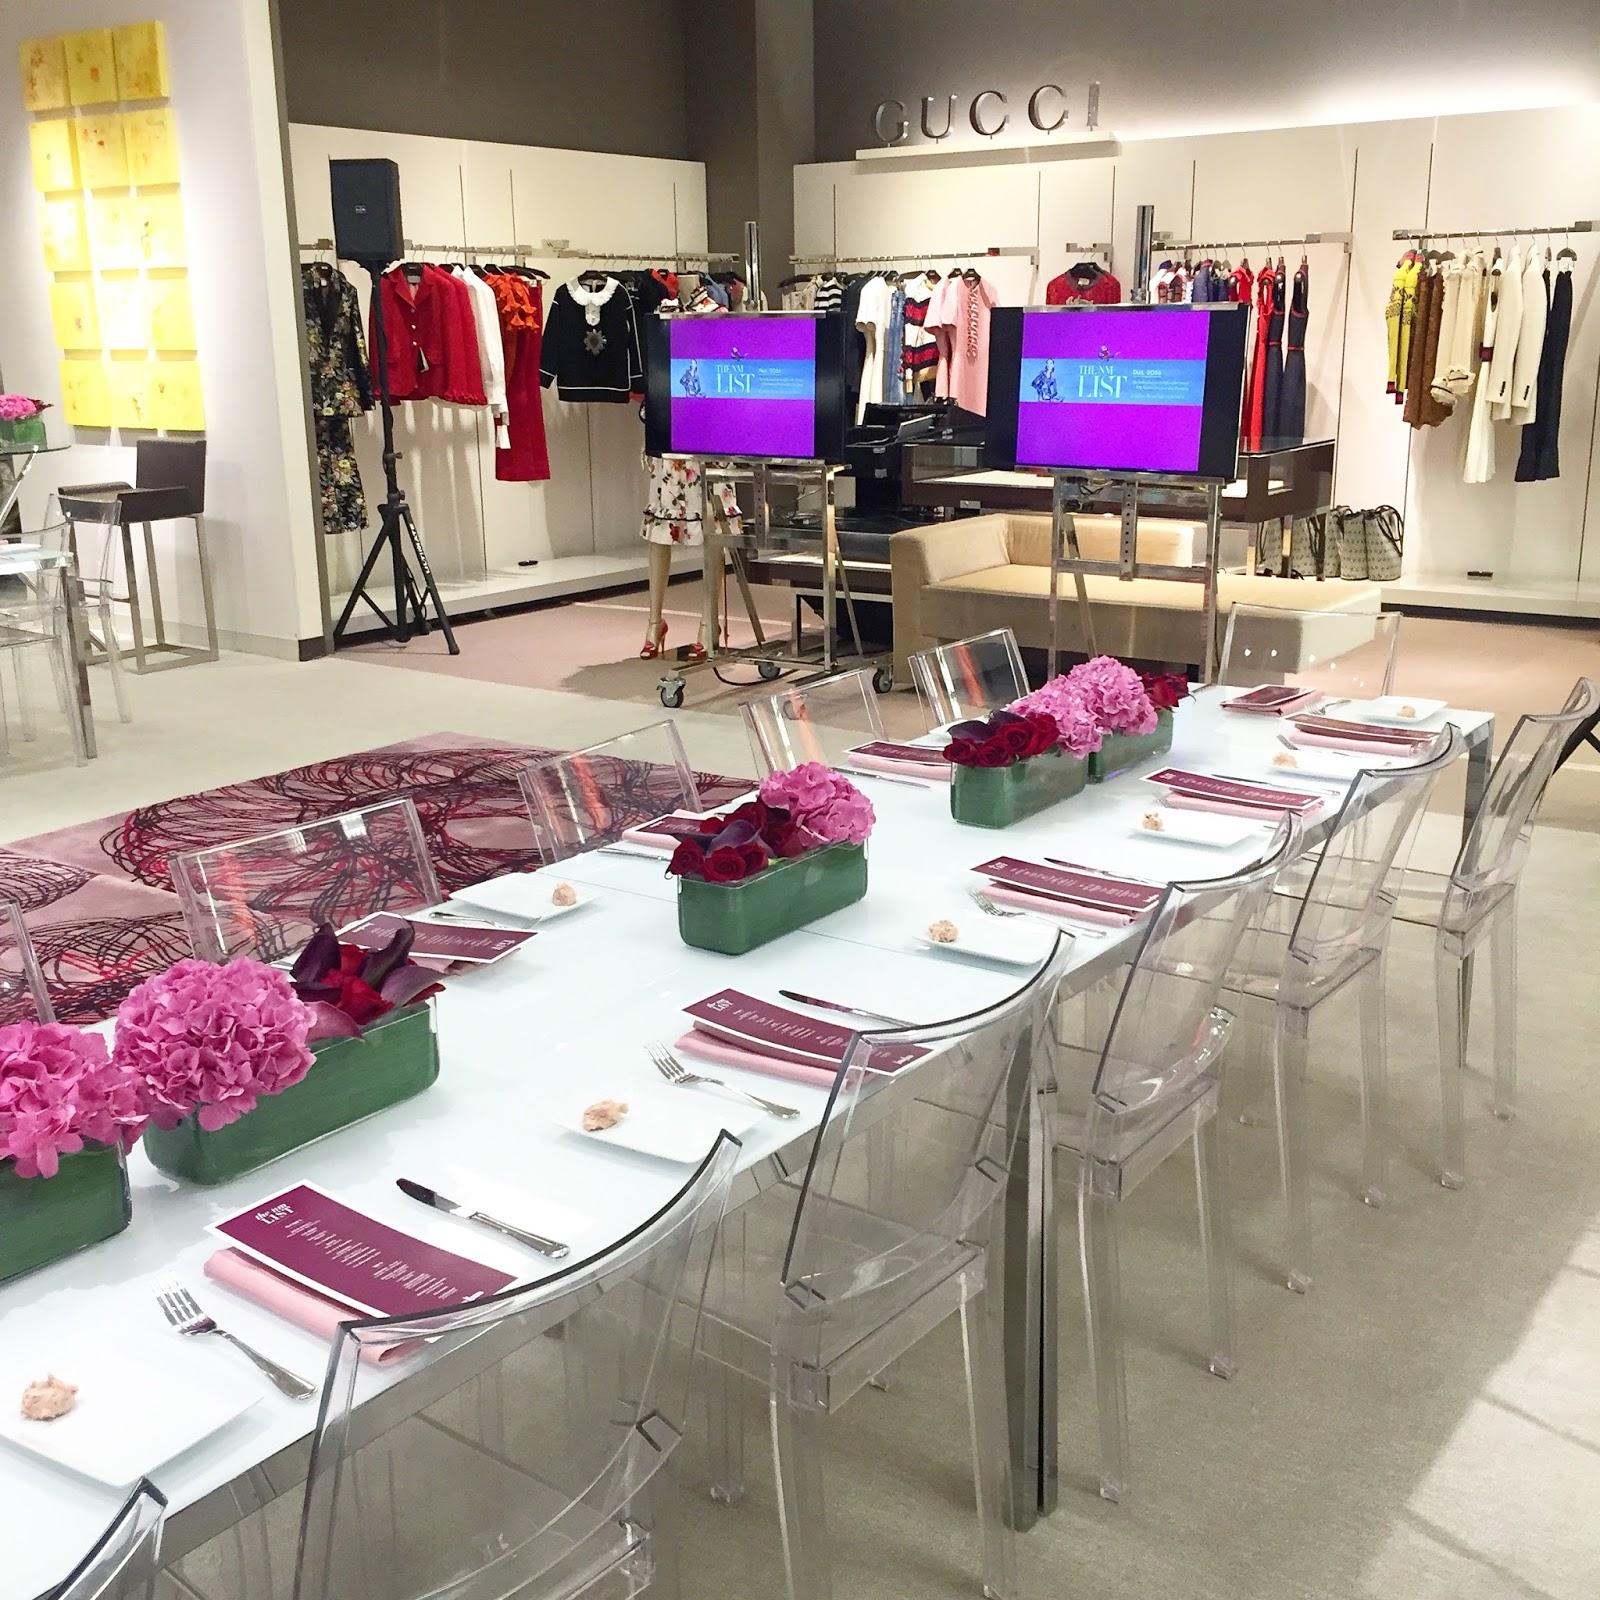 Neiman Marcus Fashion Valley Bloggers Brunch, Neiman Marcus Fashion Valley, chic brunch decor, bloggers brunch decor, fall 2016 san diego fashion